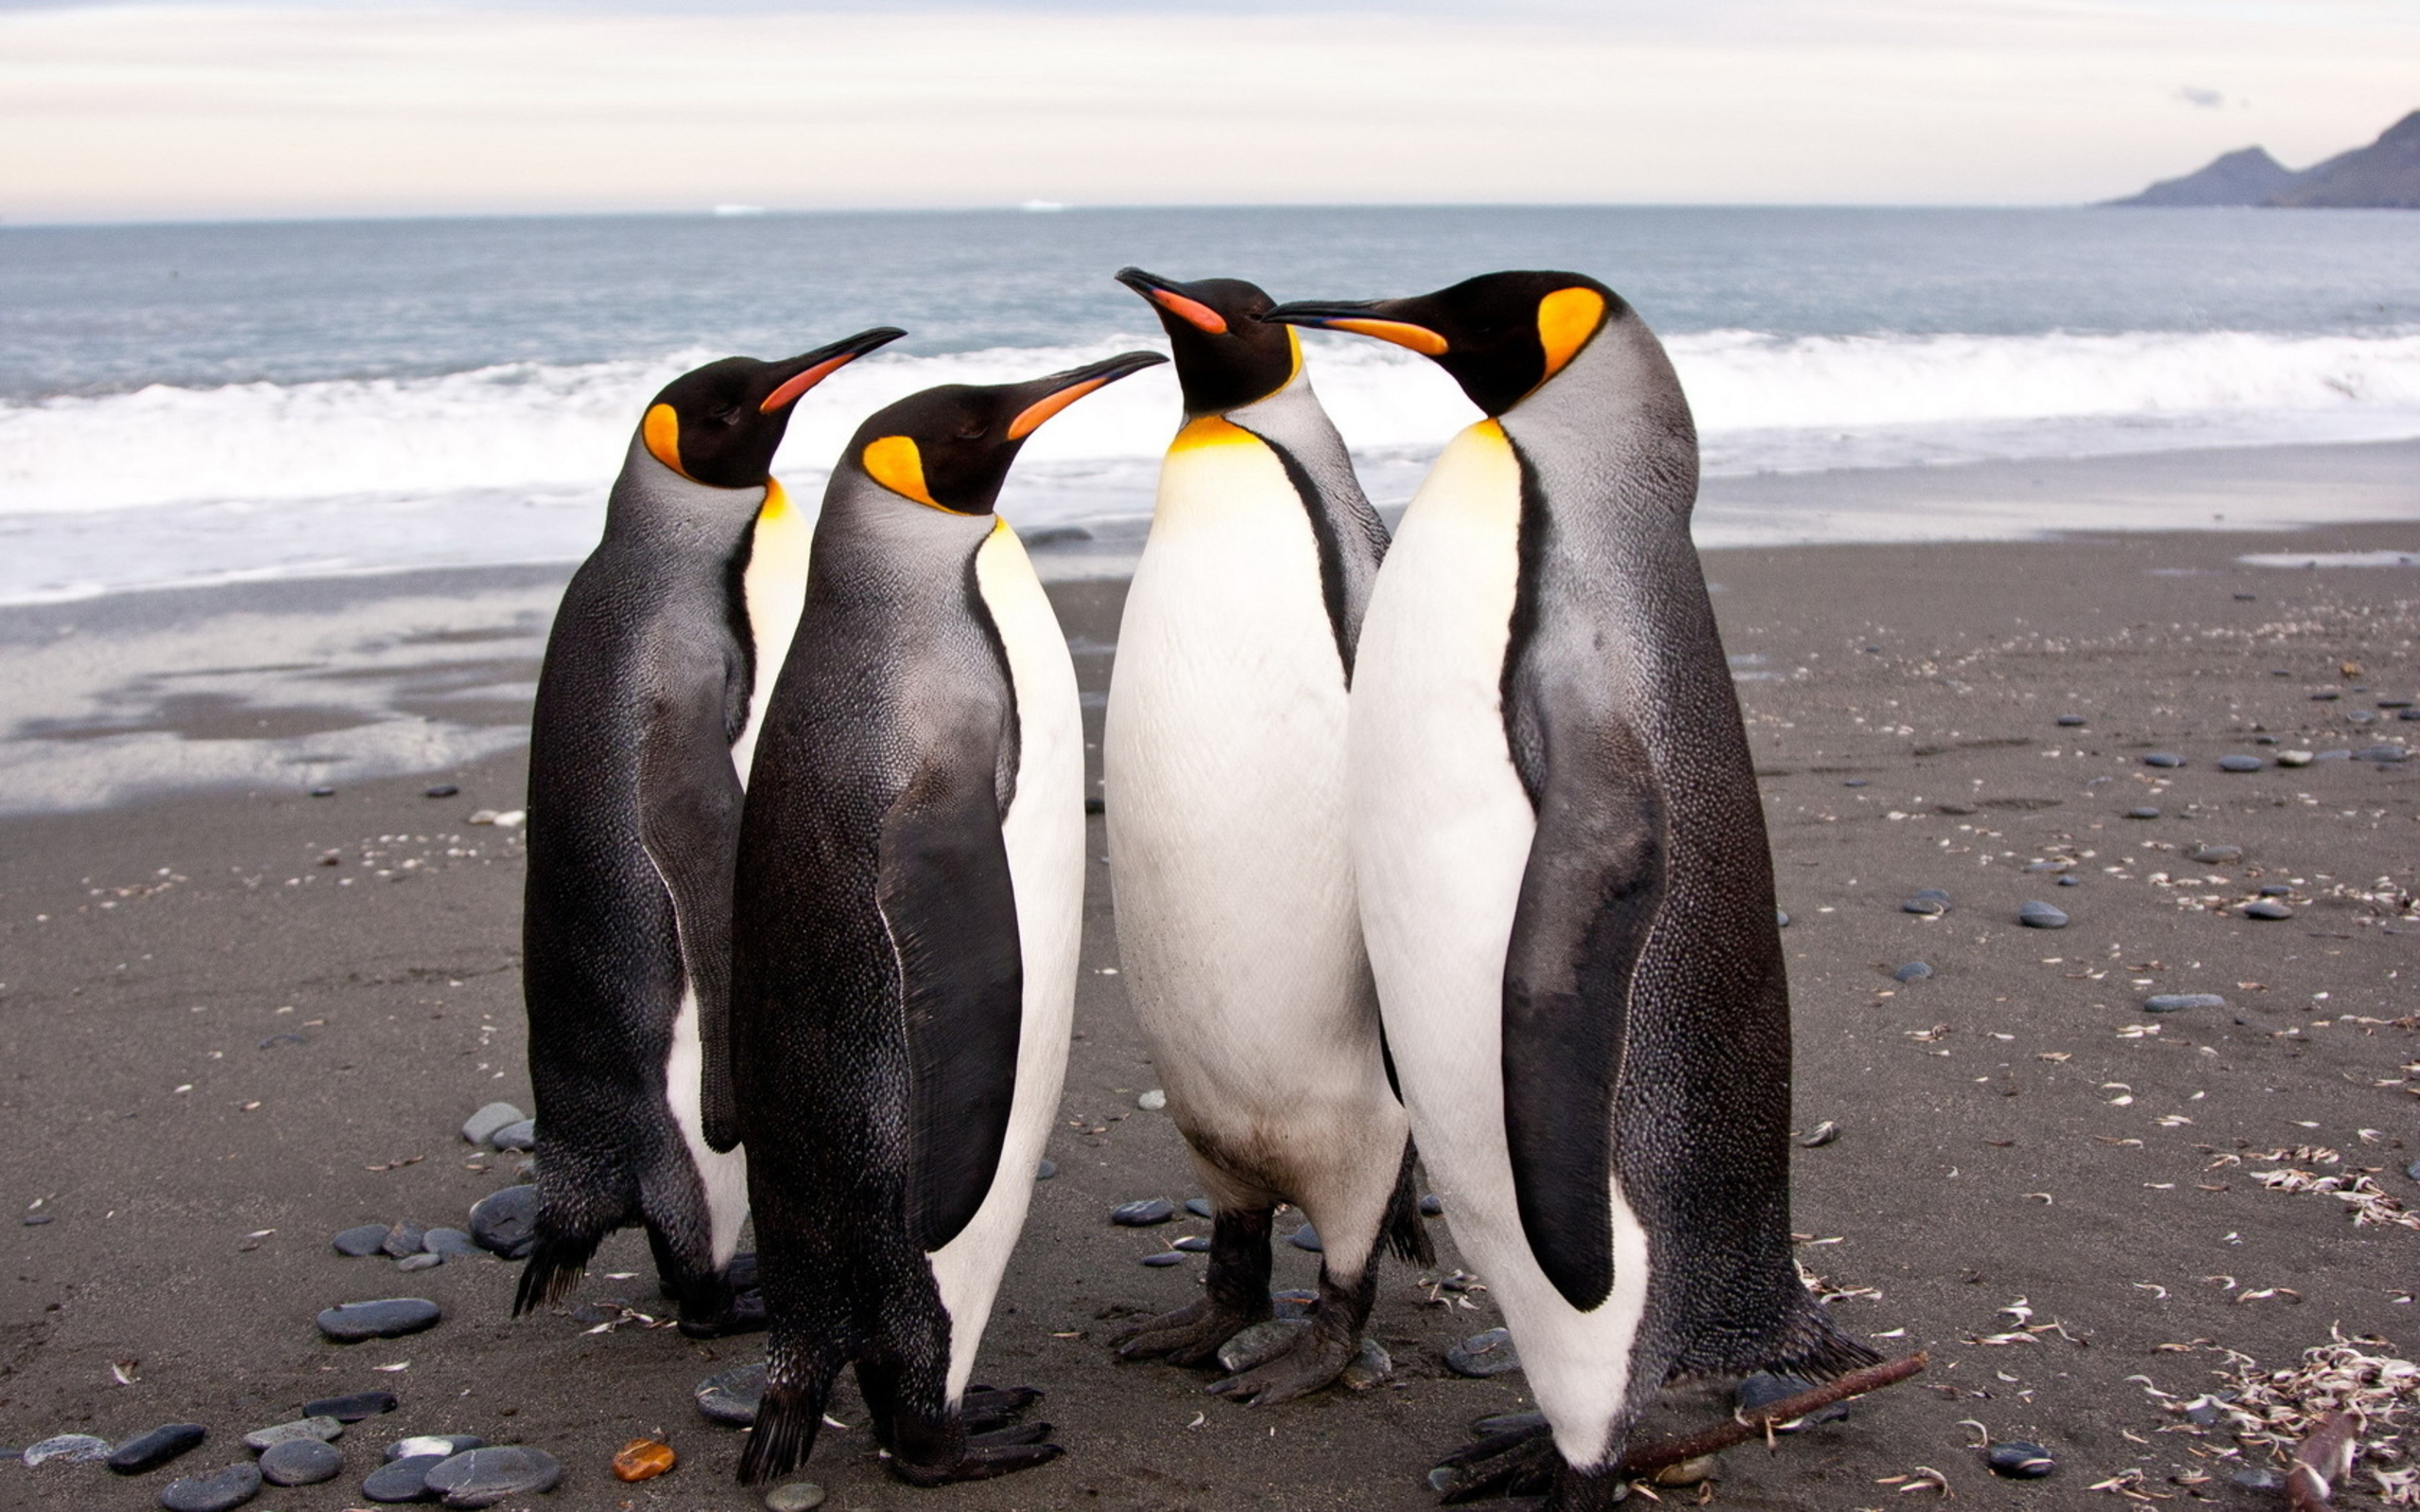 пингвин красивая картинка фанатичный отец, хочет